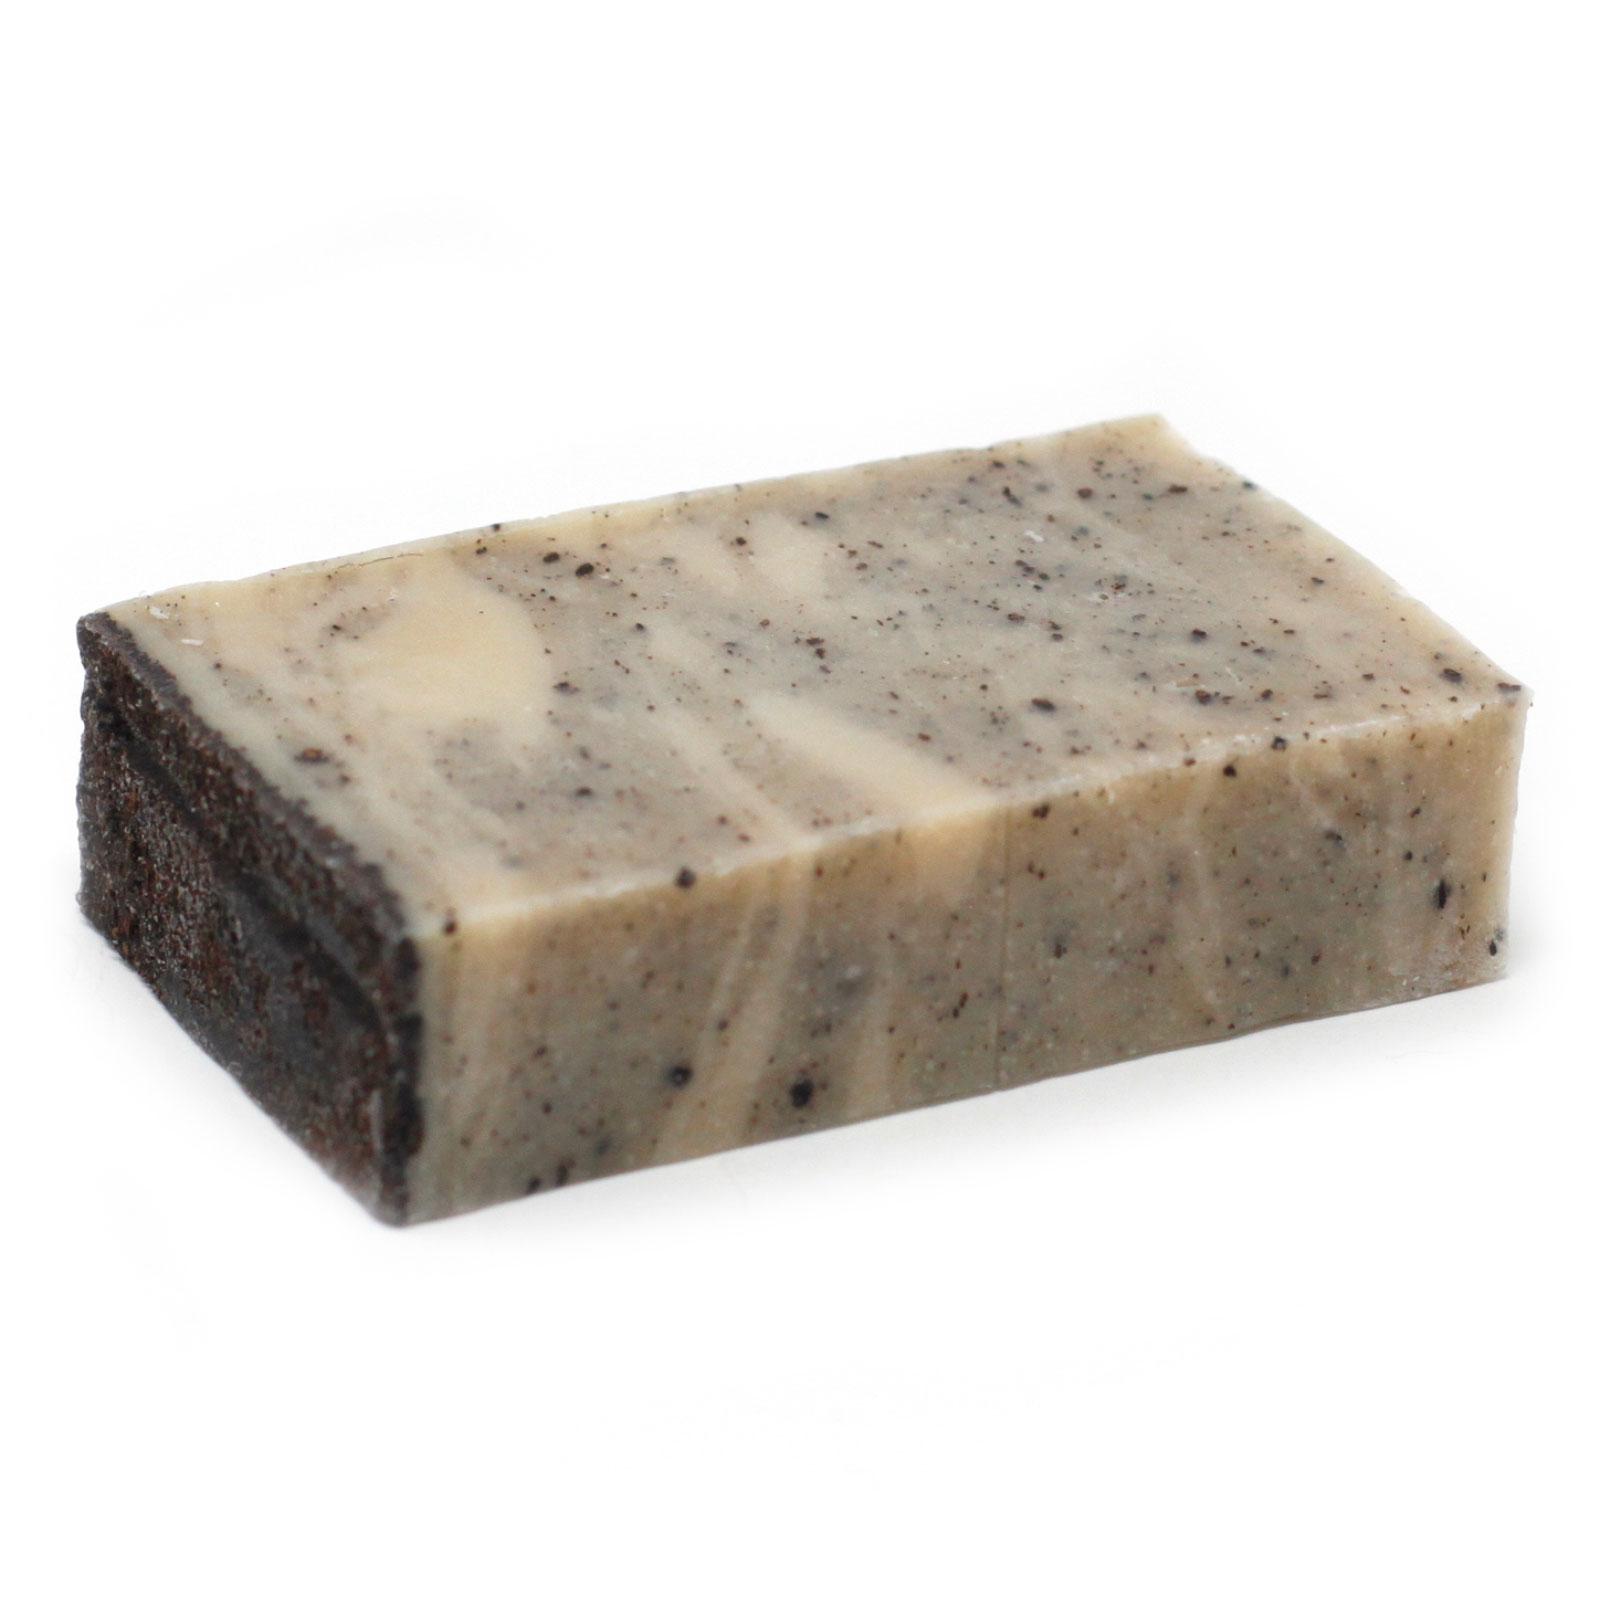 Coconut Olive Oil Soap SLICE approx 100g